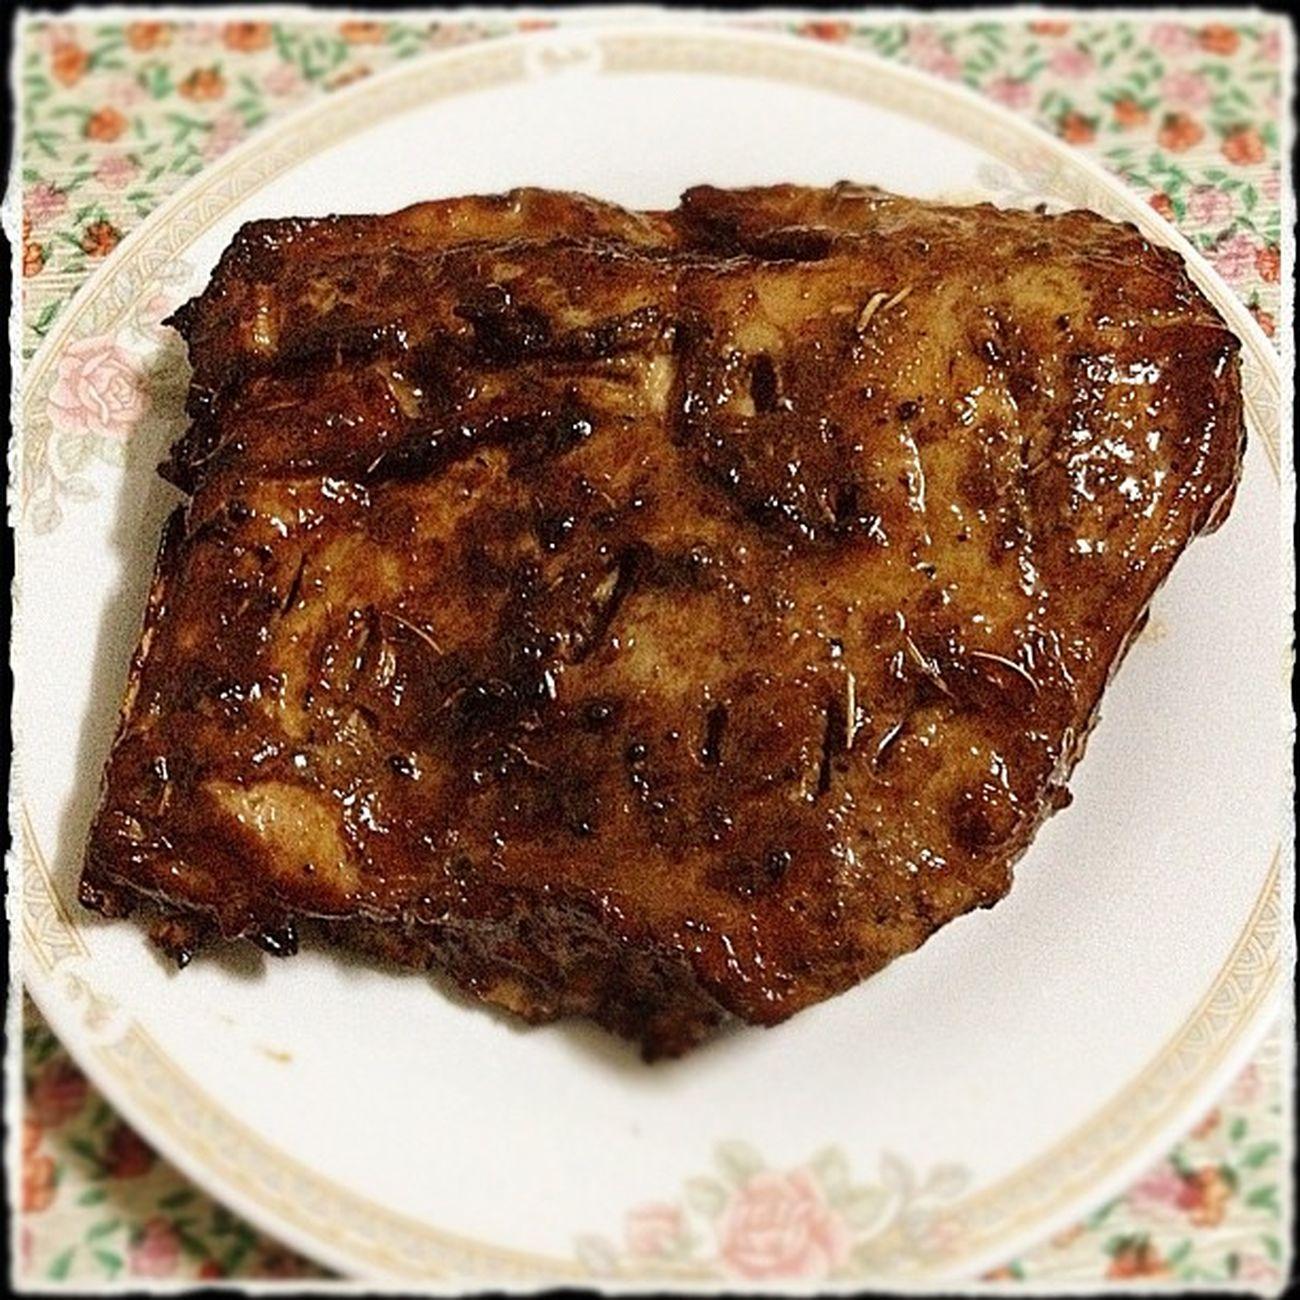 Roasted Pork Rib. (smoked) Supper Dinner